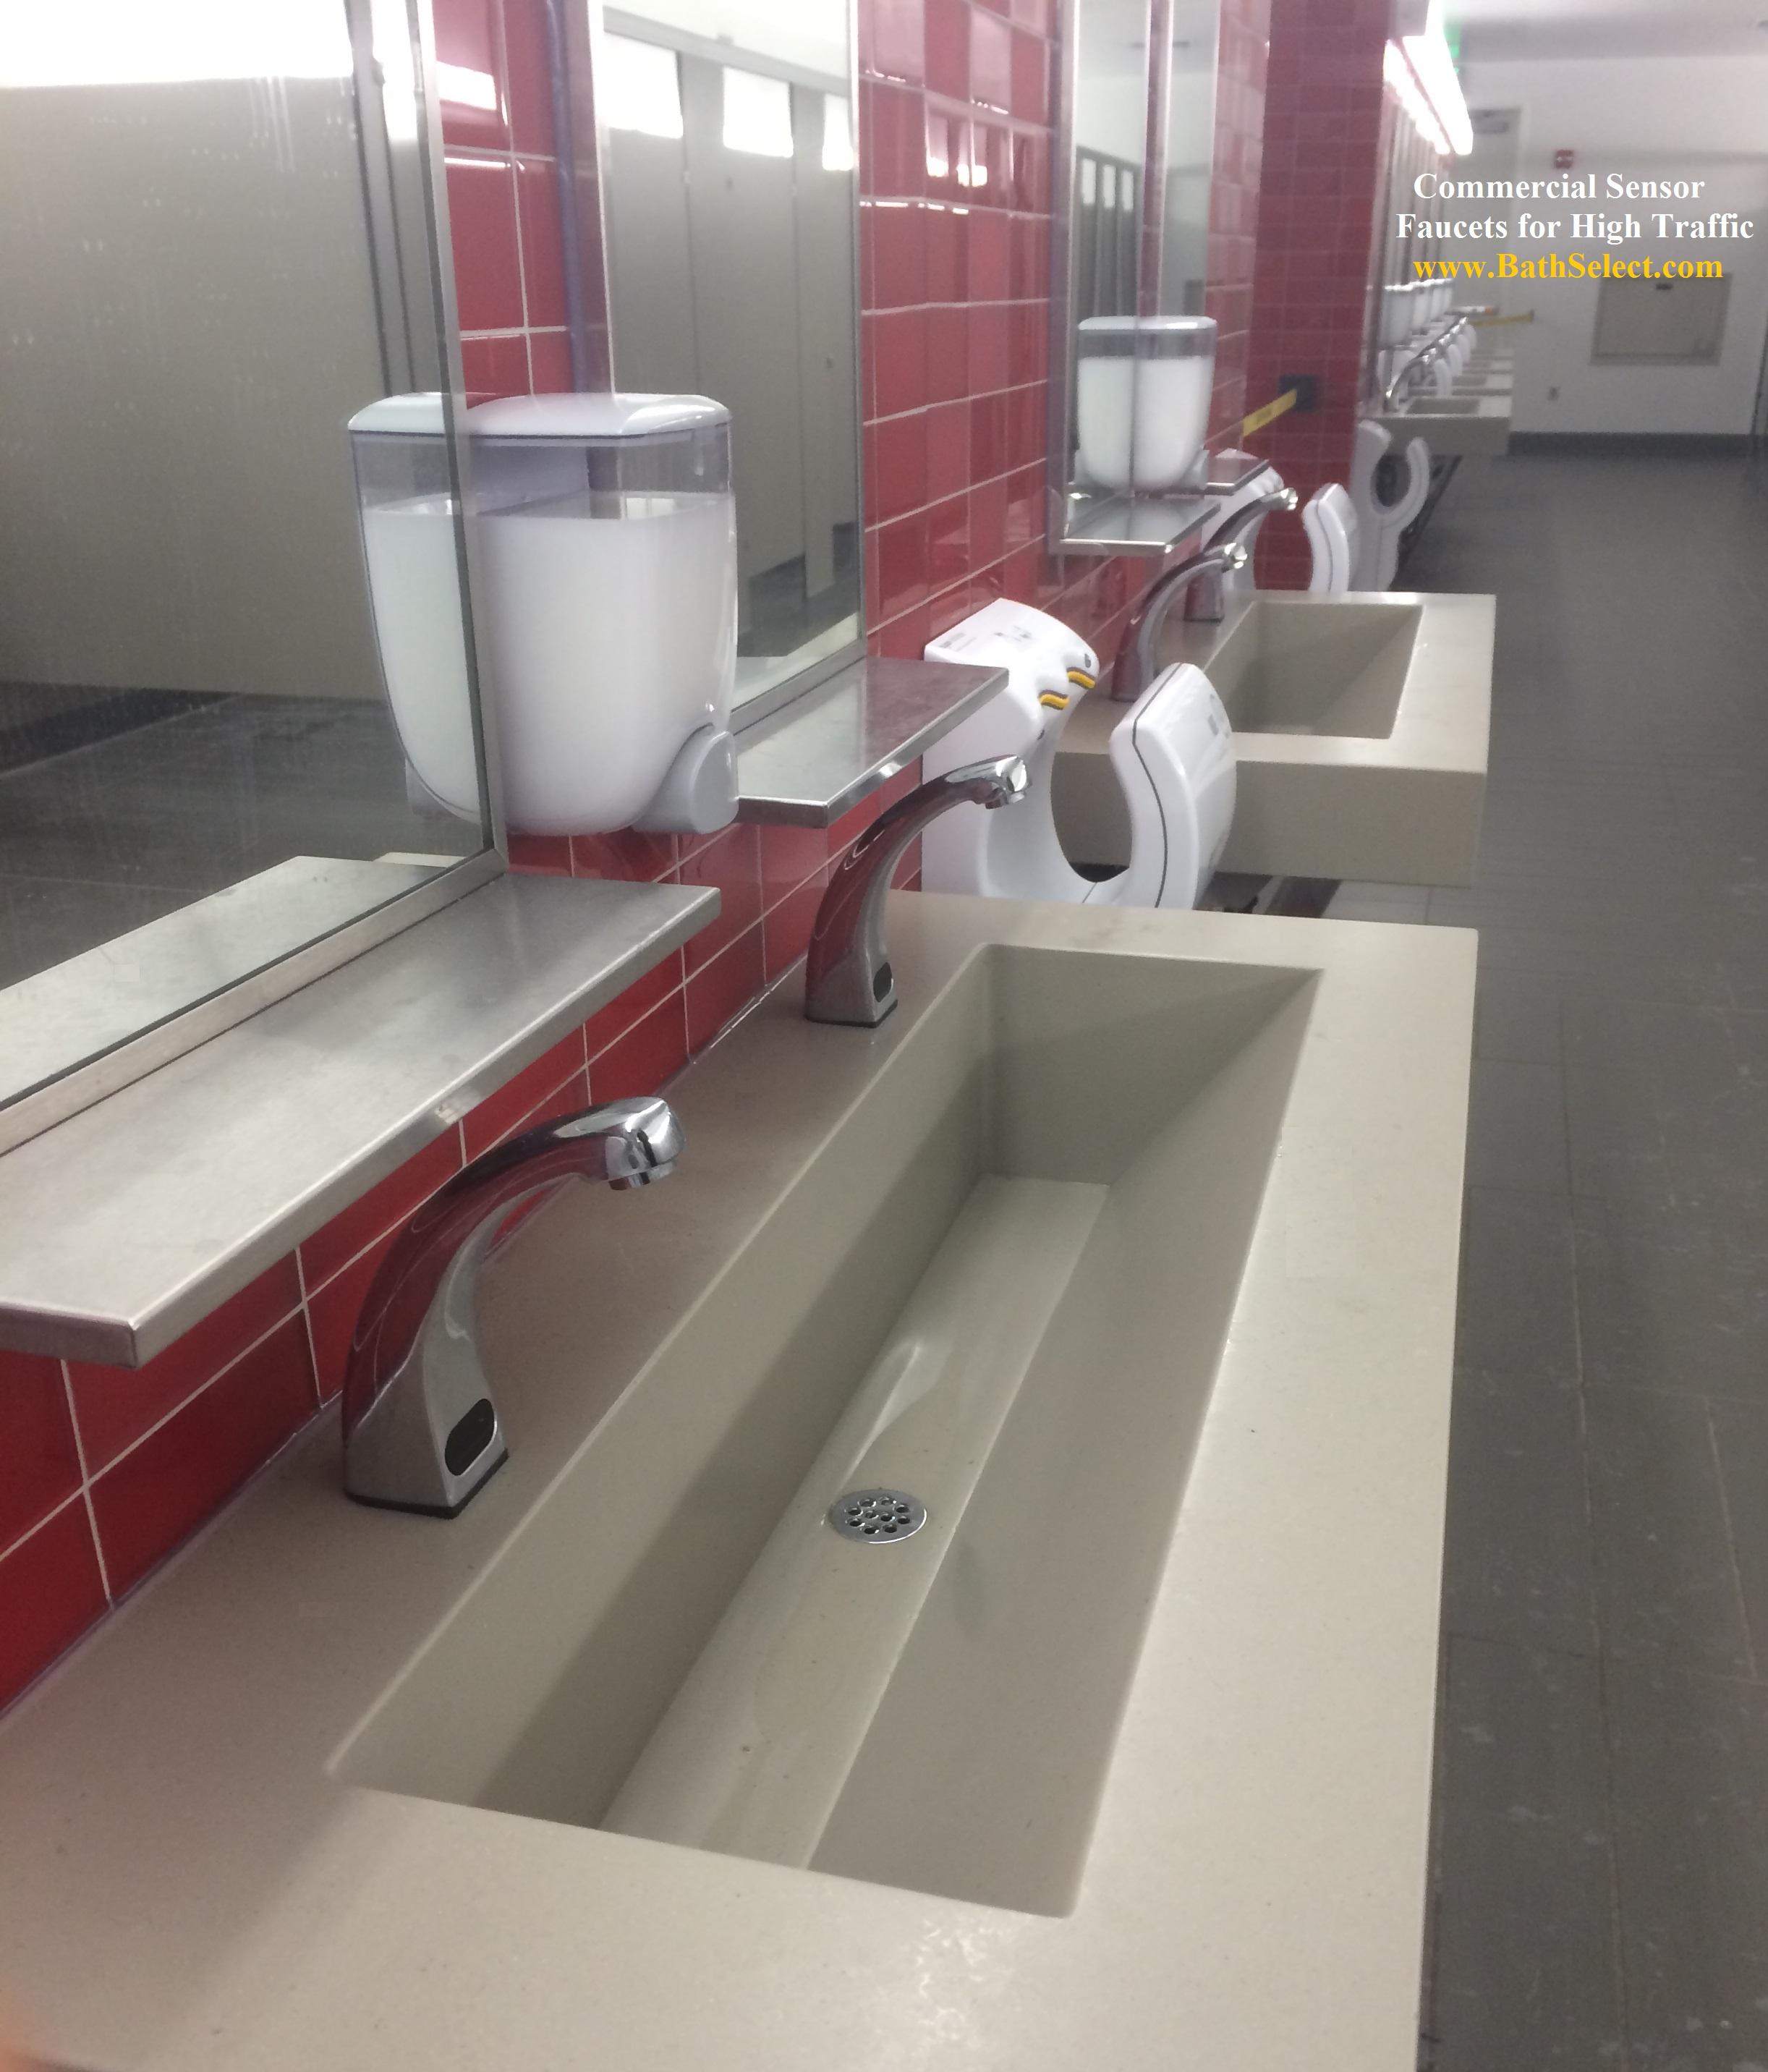 Malls Shopping Centers ADA mercial Sensor Faucets